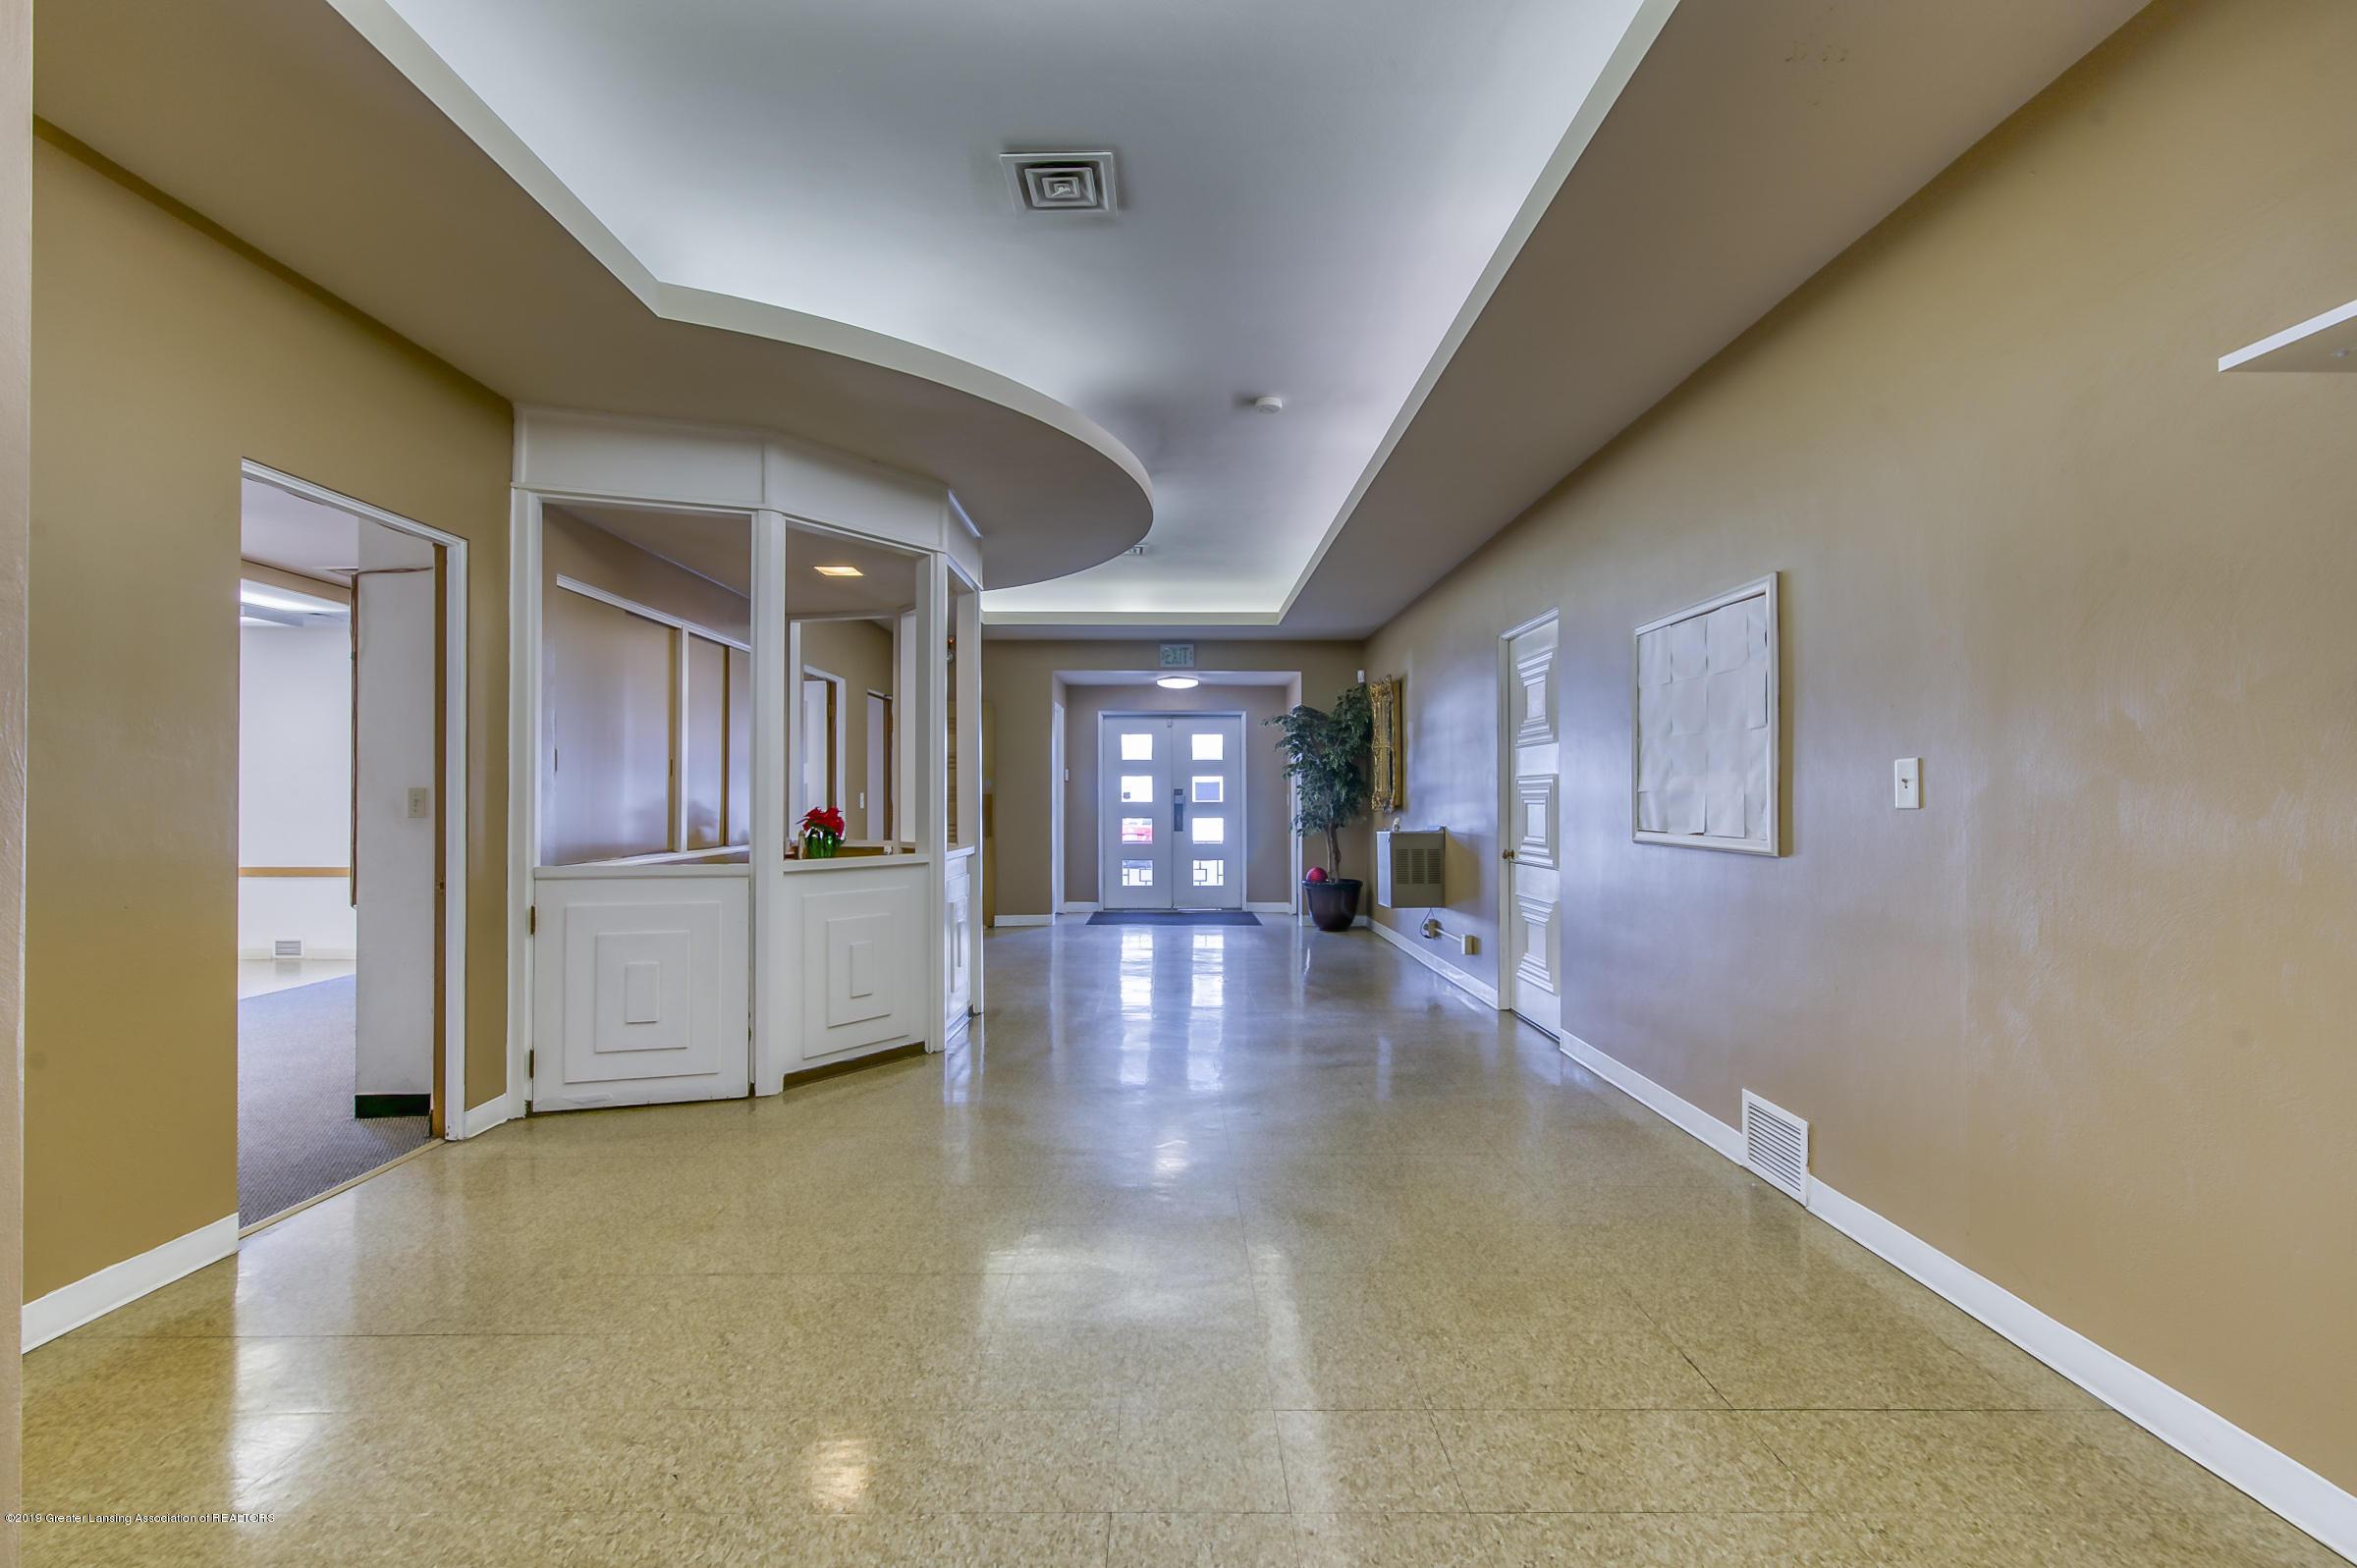 505 Seymour Ave - Corridor - 7